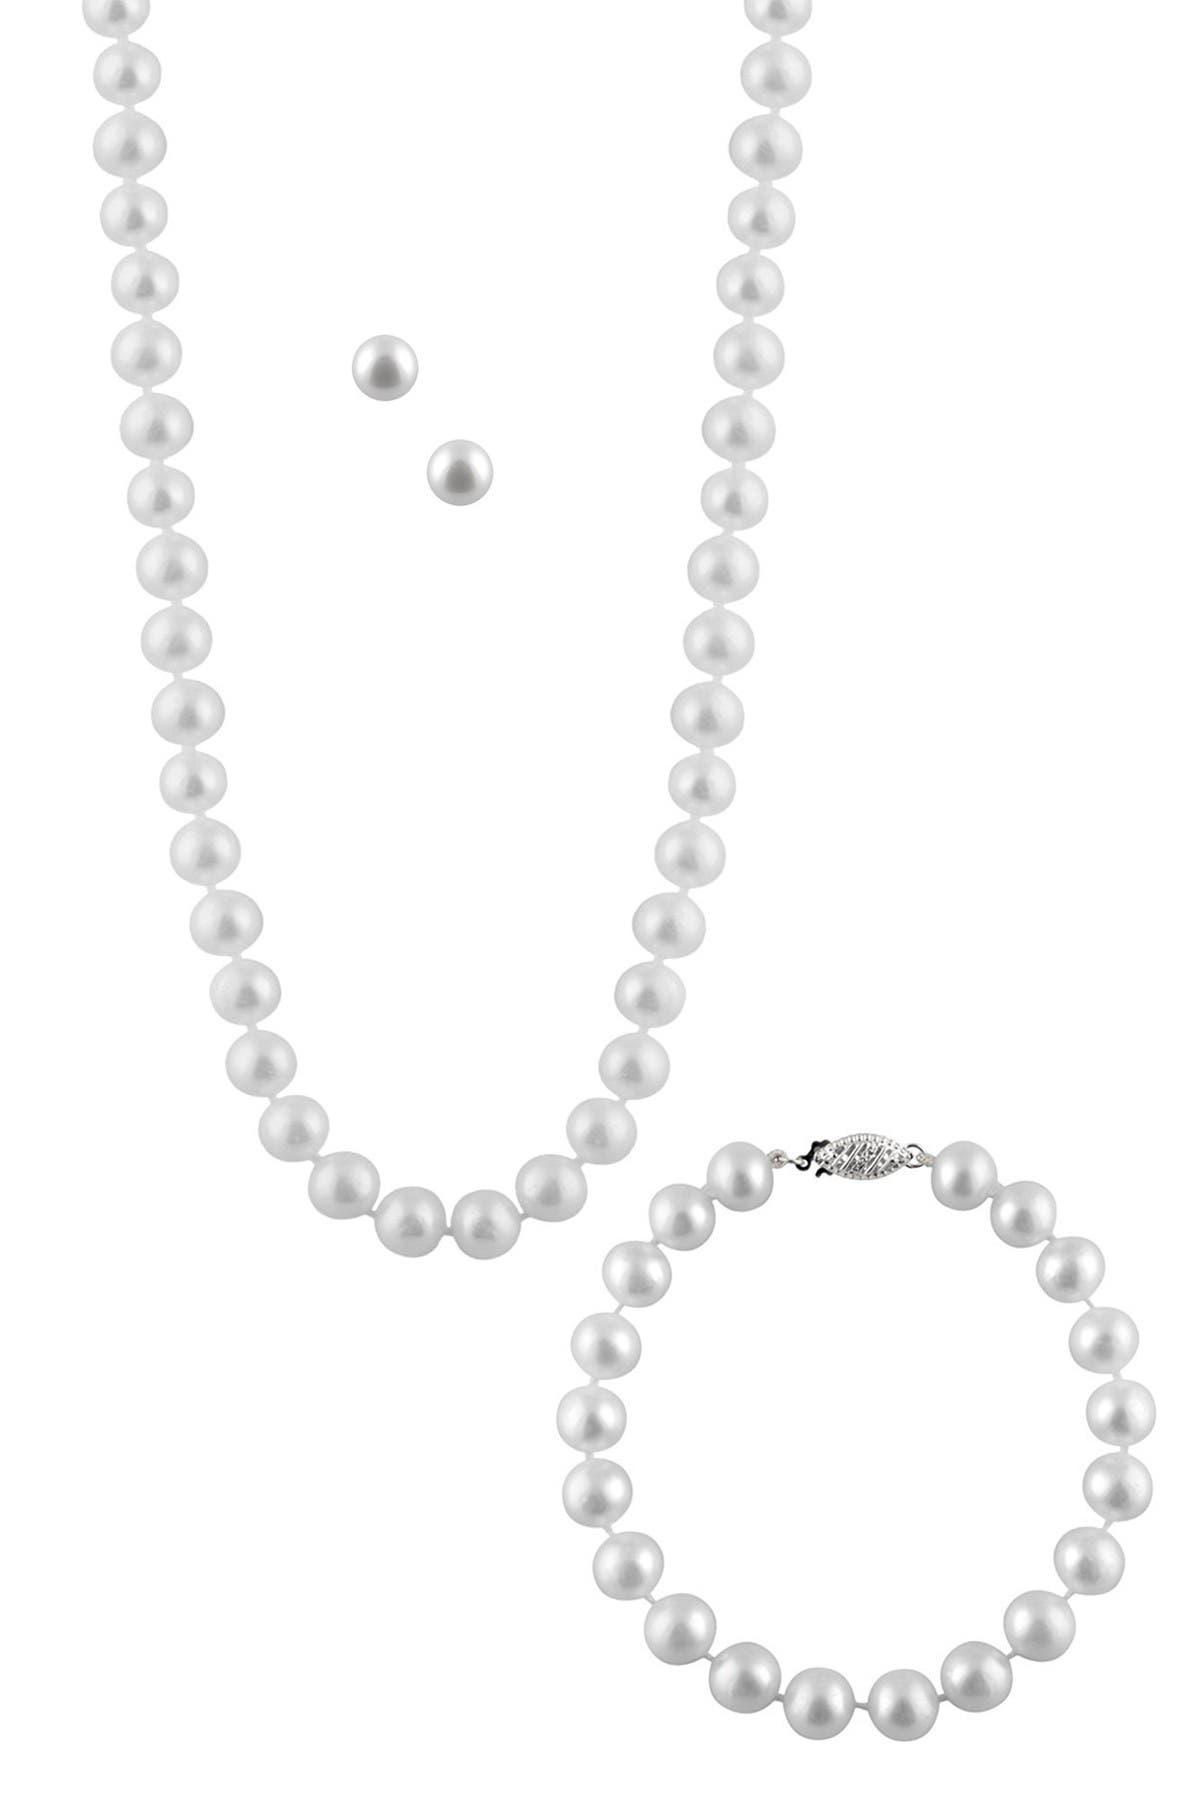 Image of Splendid Pearls 7-8mm Freshwater Pearl Necklace, Bracelet, & Earrings 3-Piece Set